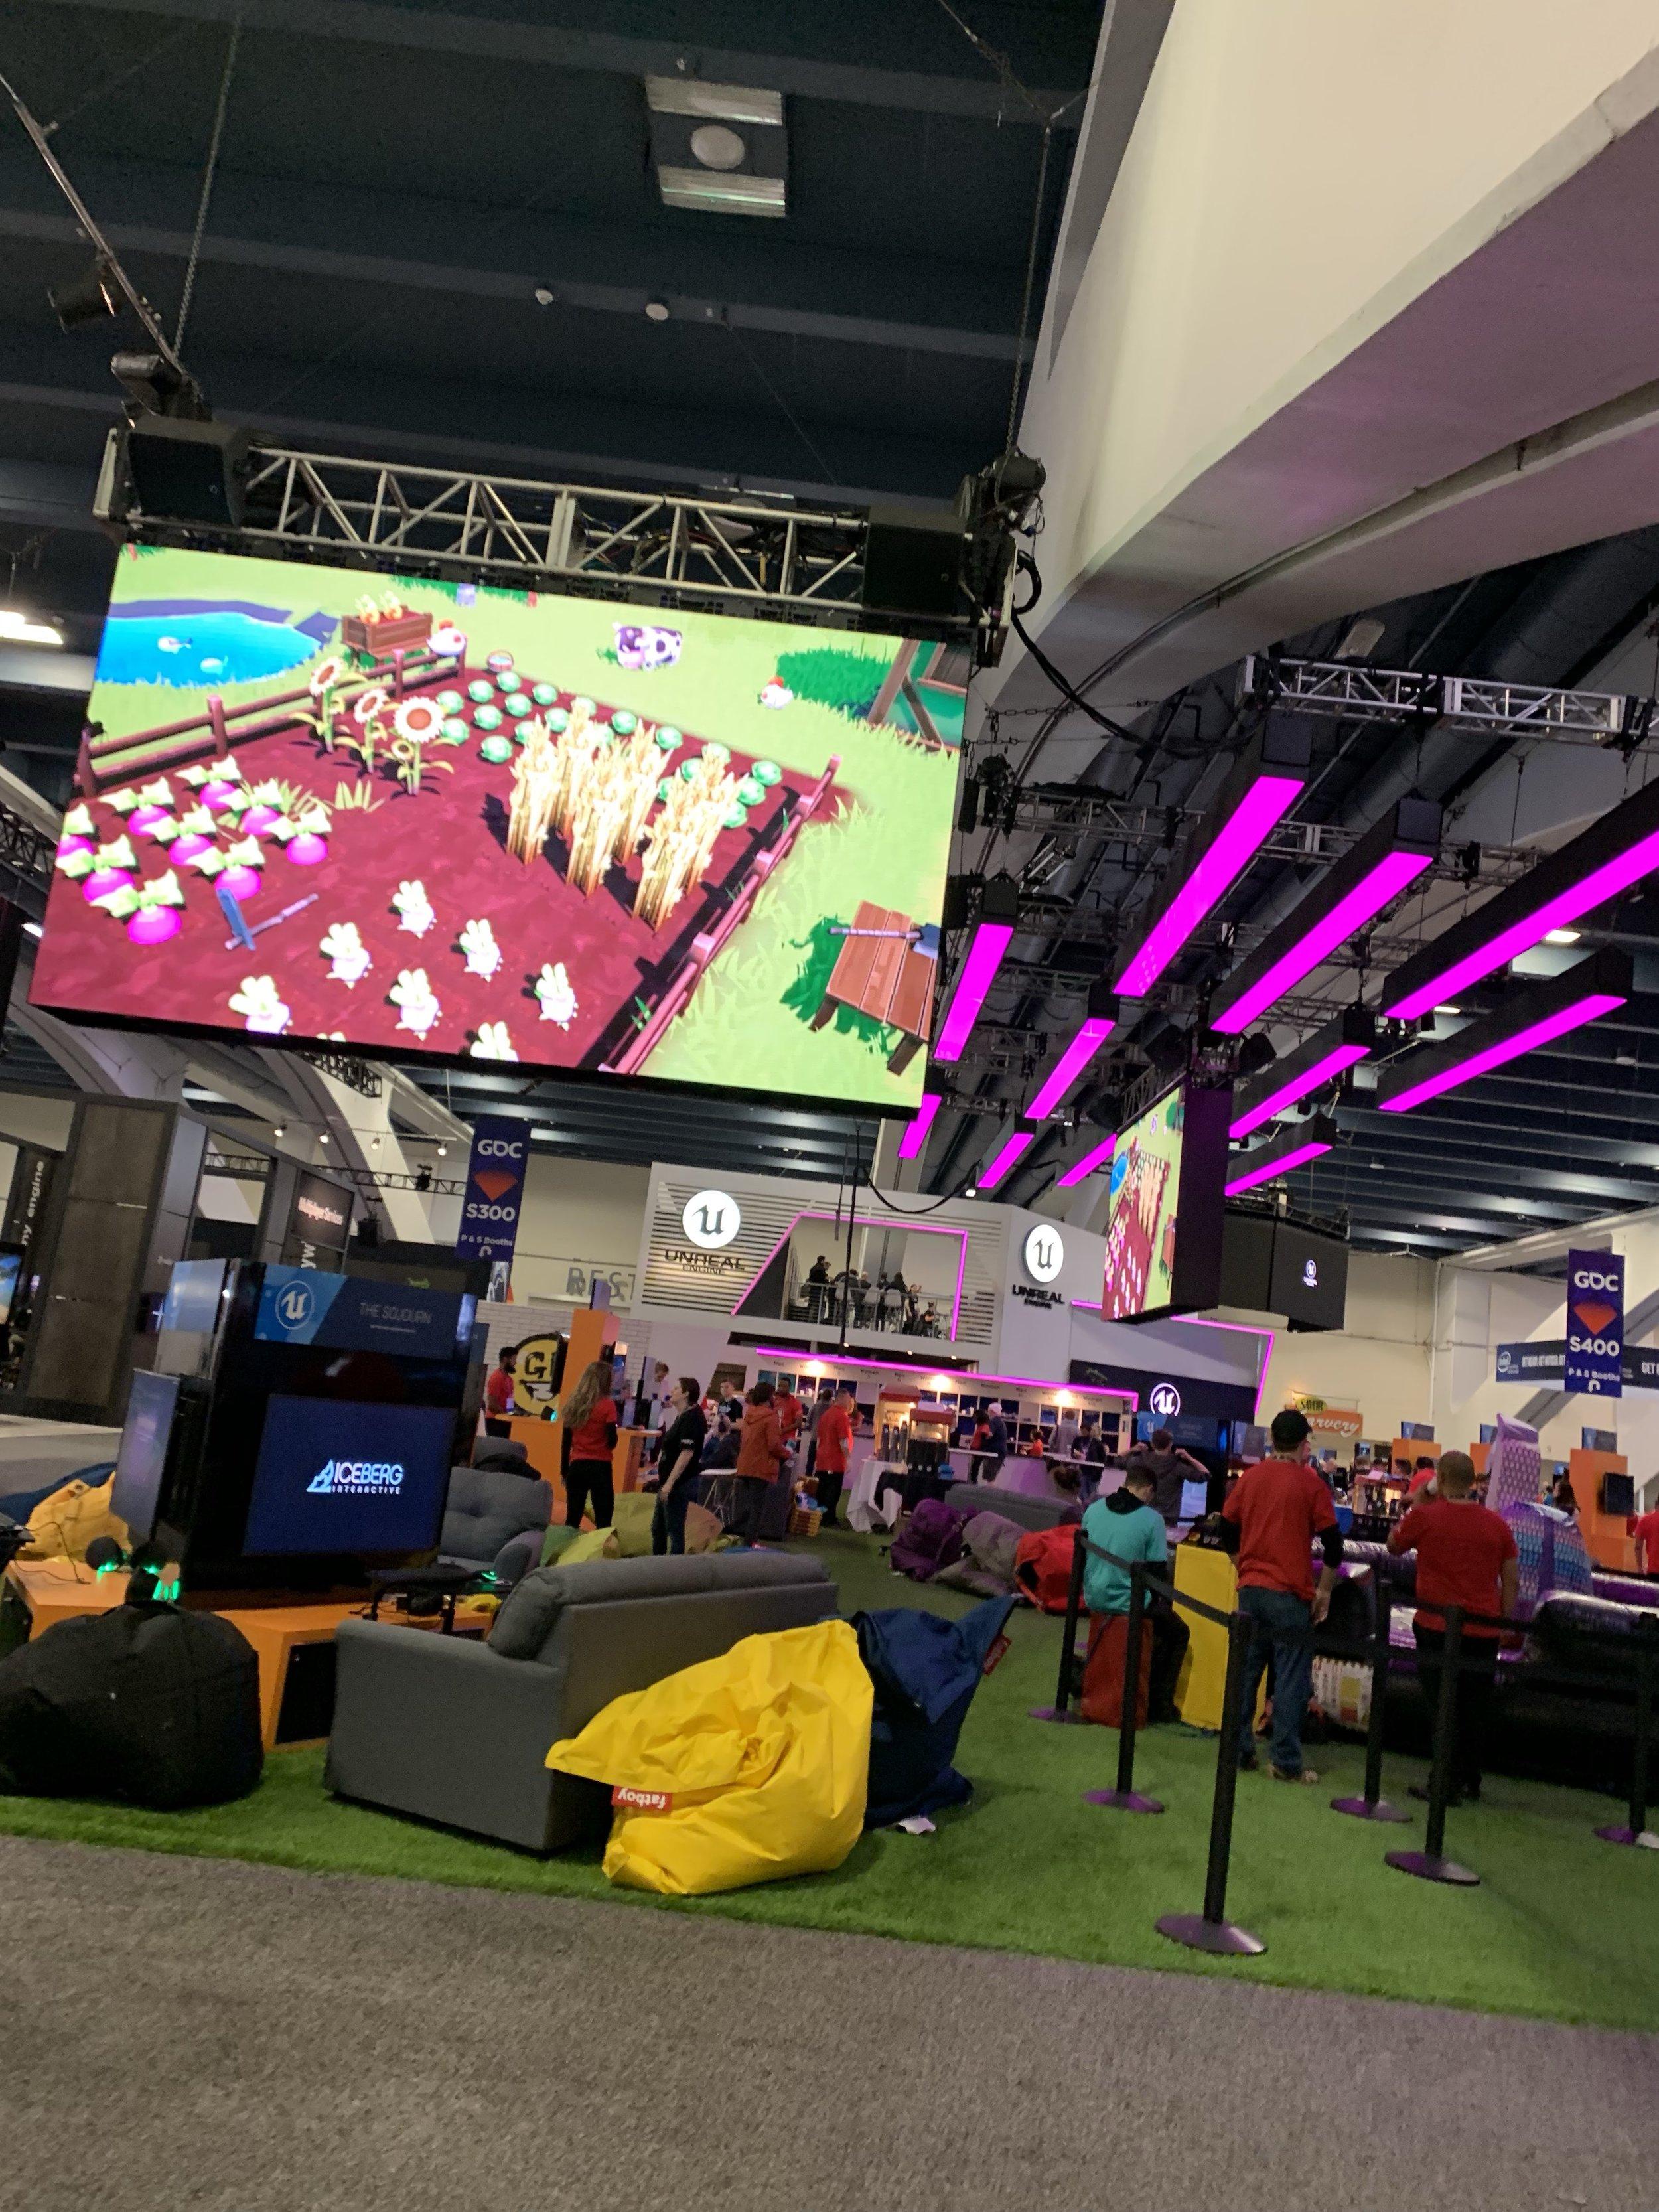 Farm Folks was on the big screen at GDC 2019